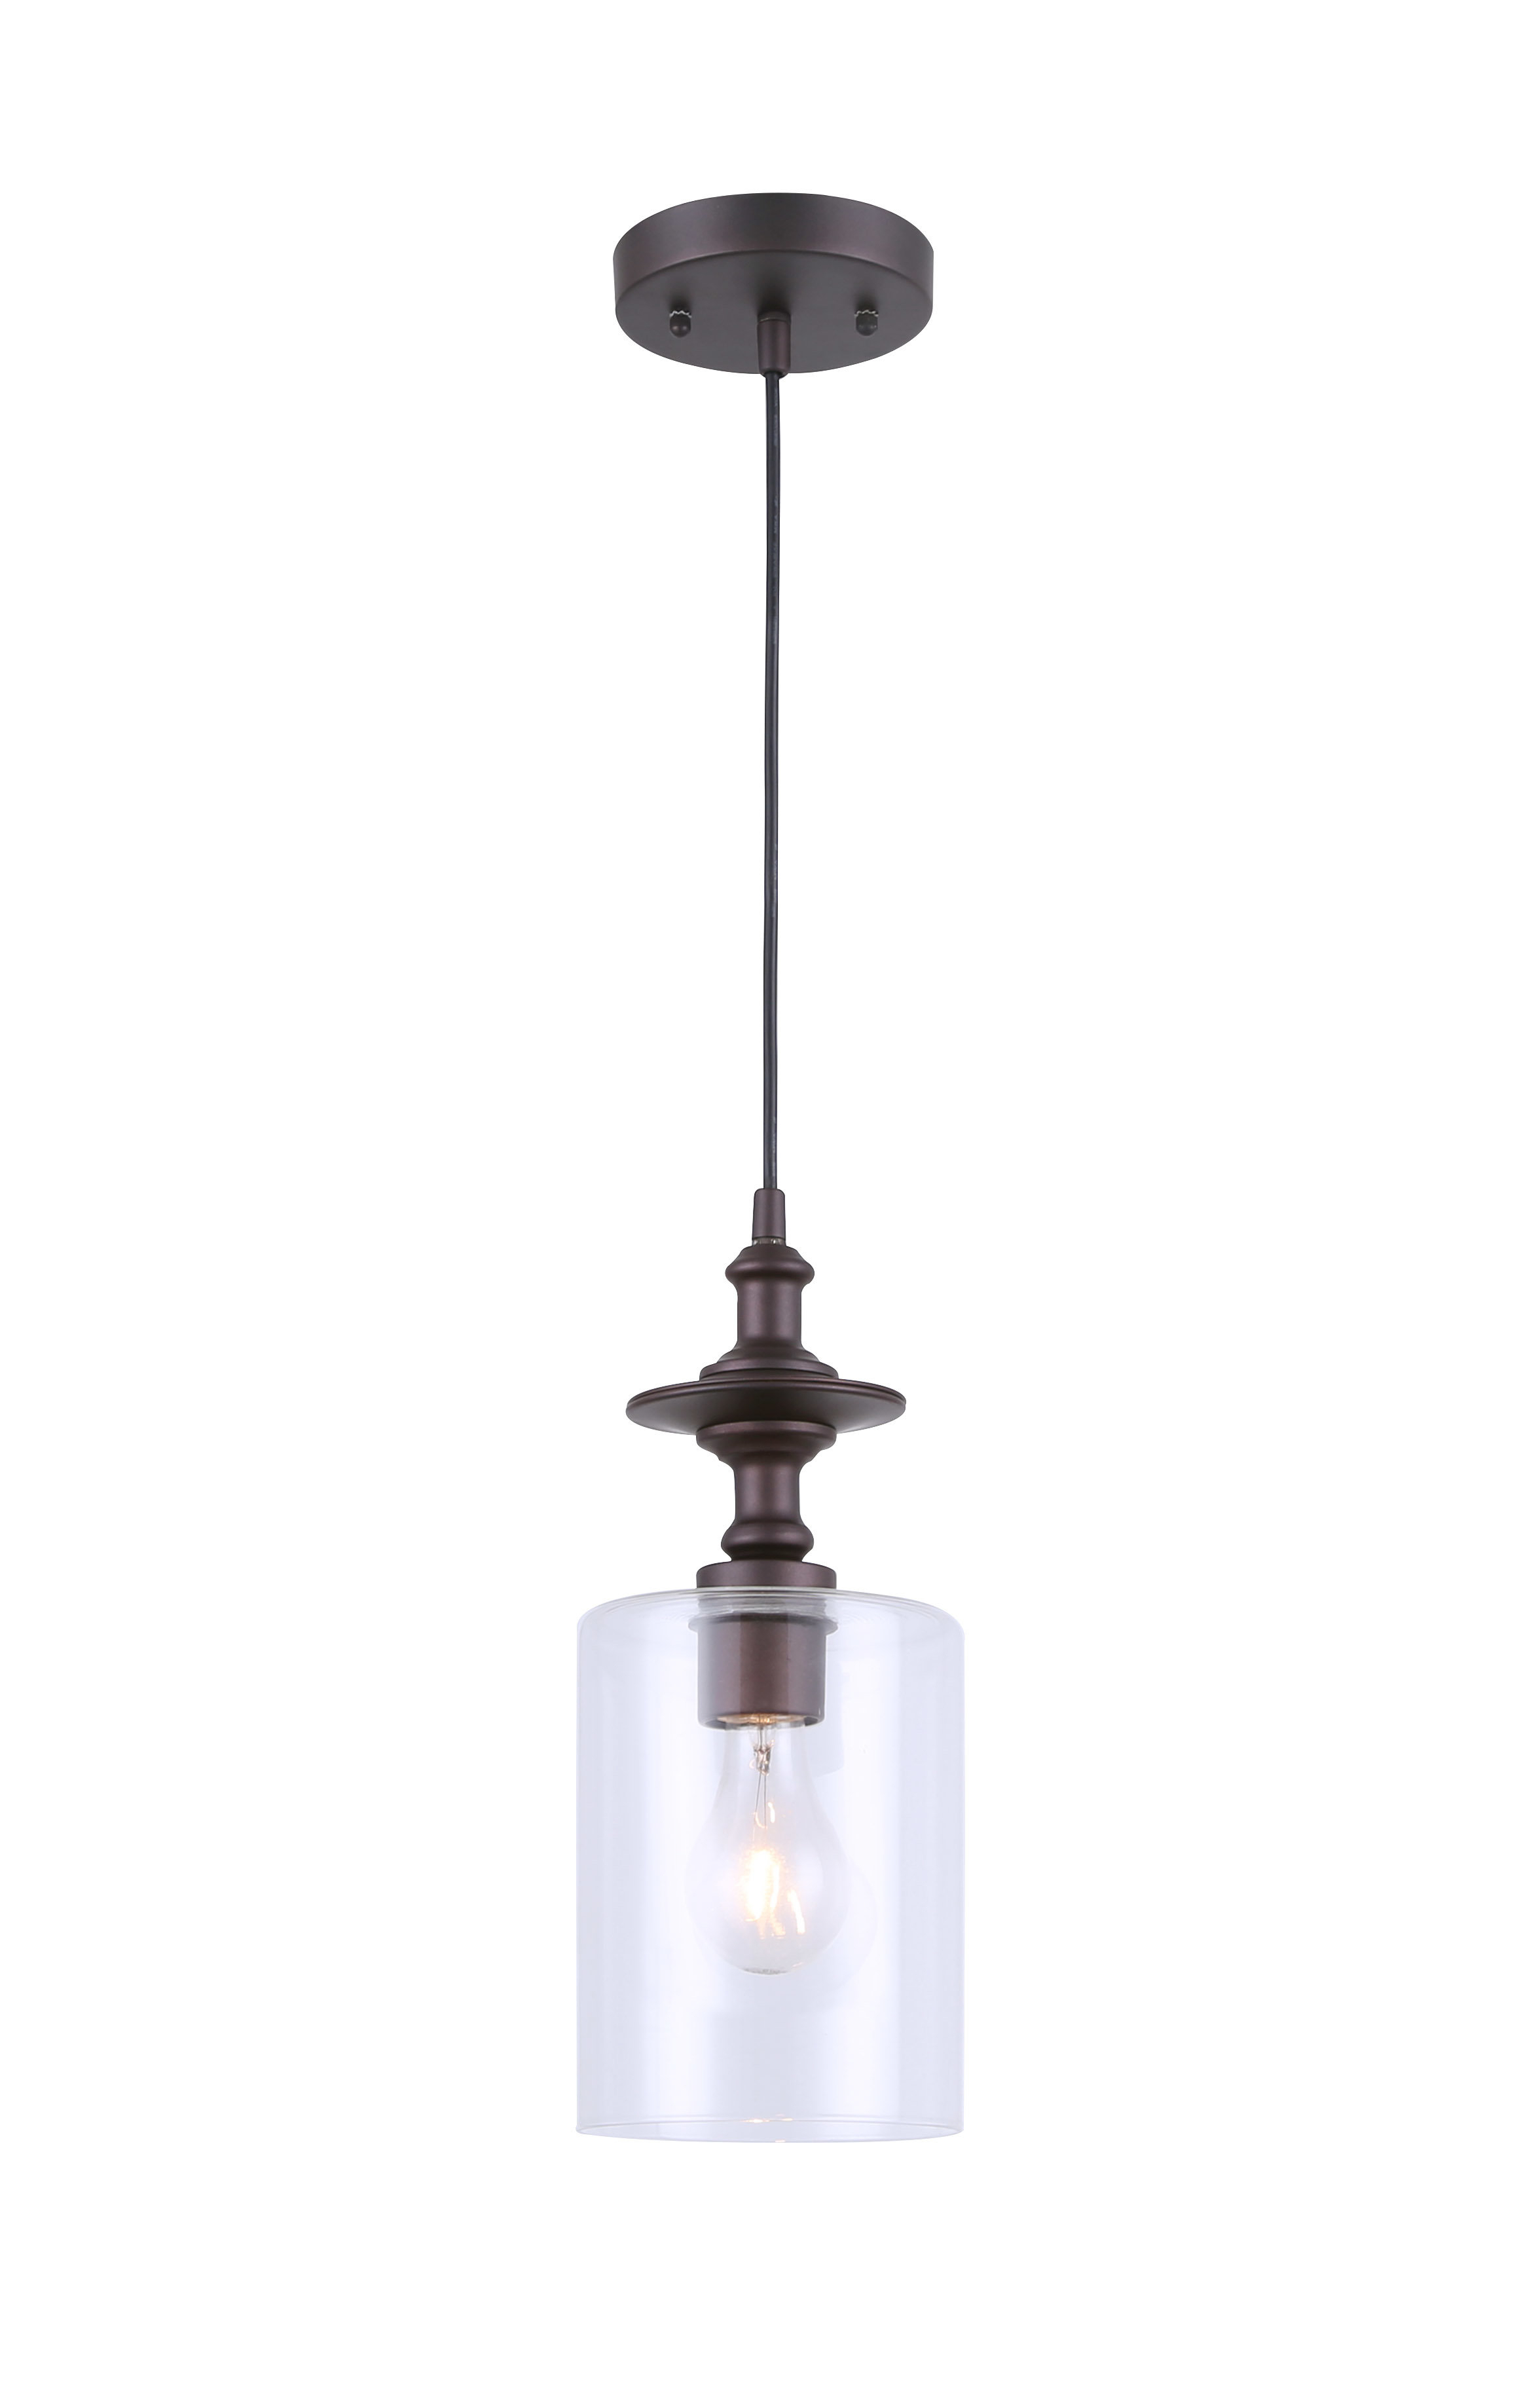 Wayfair Pertaining To 2019 Oldbury 1 Light Single Cylinder Pendants (Gallery 6 of 20)